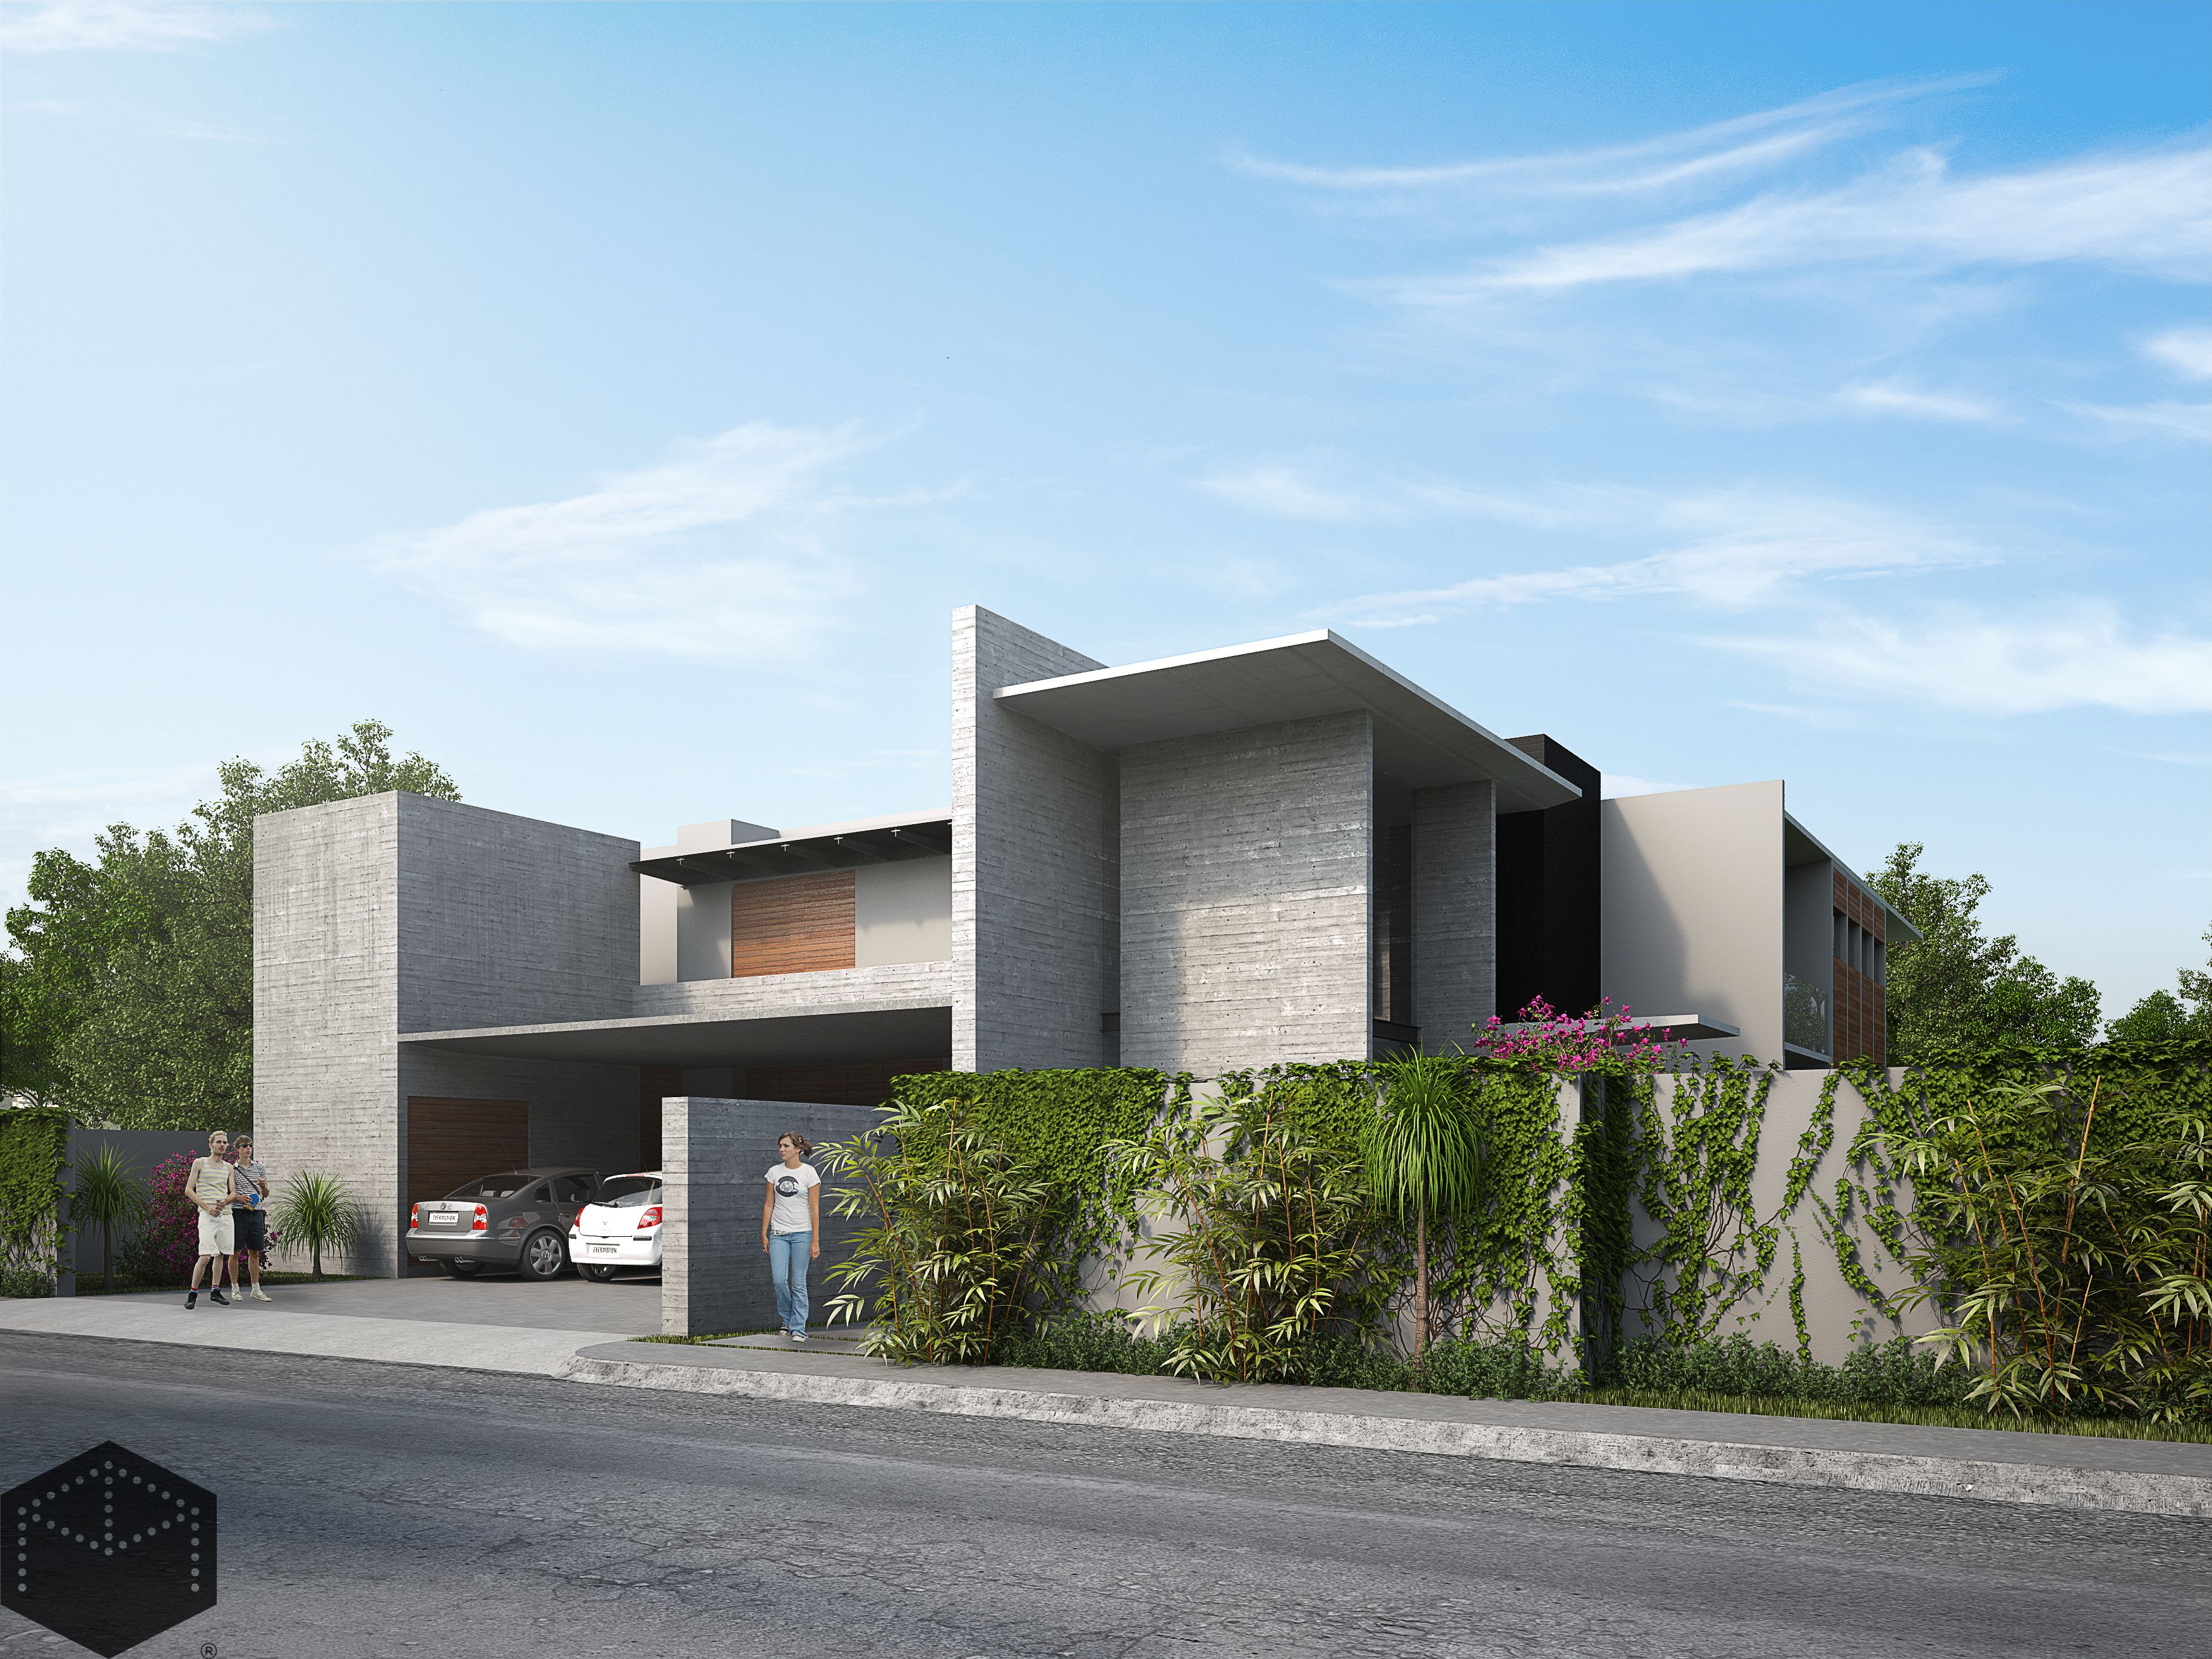 Casa habitacion dise o arquitectonico arquitectura for Diseno de casa habitacion